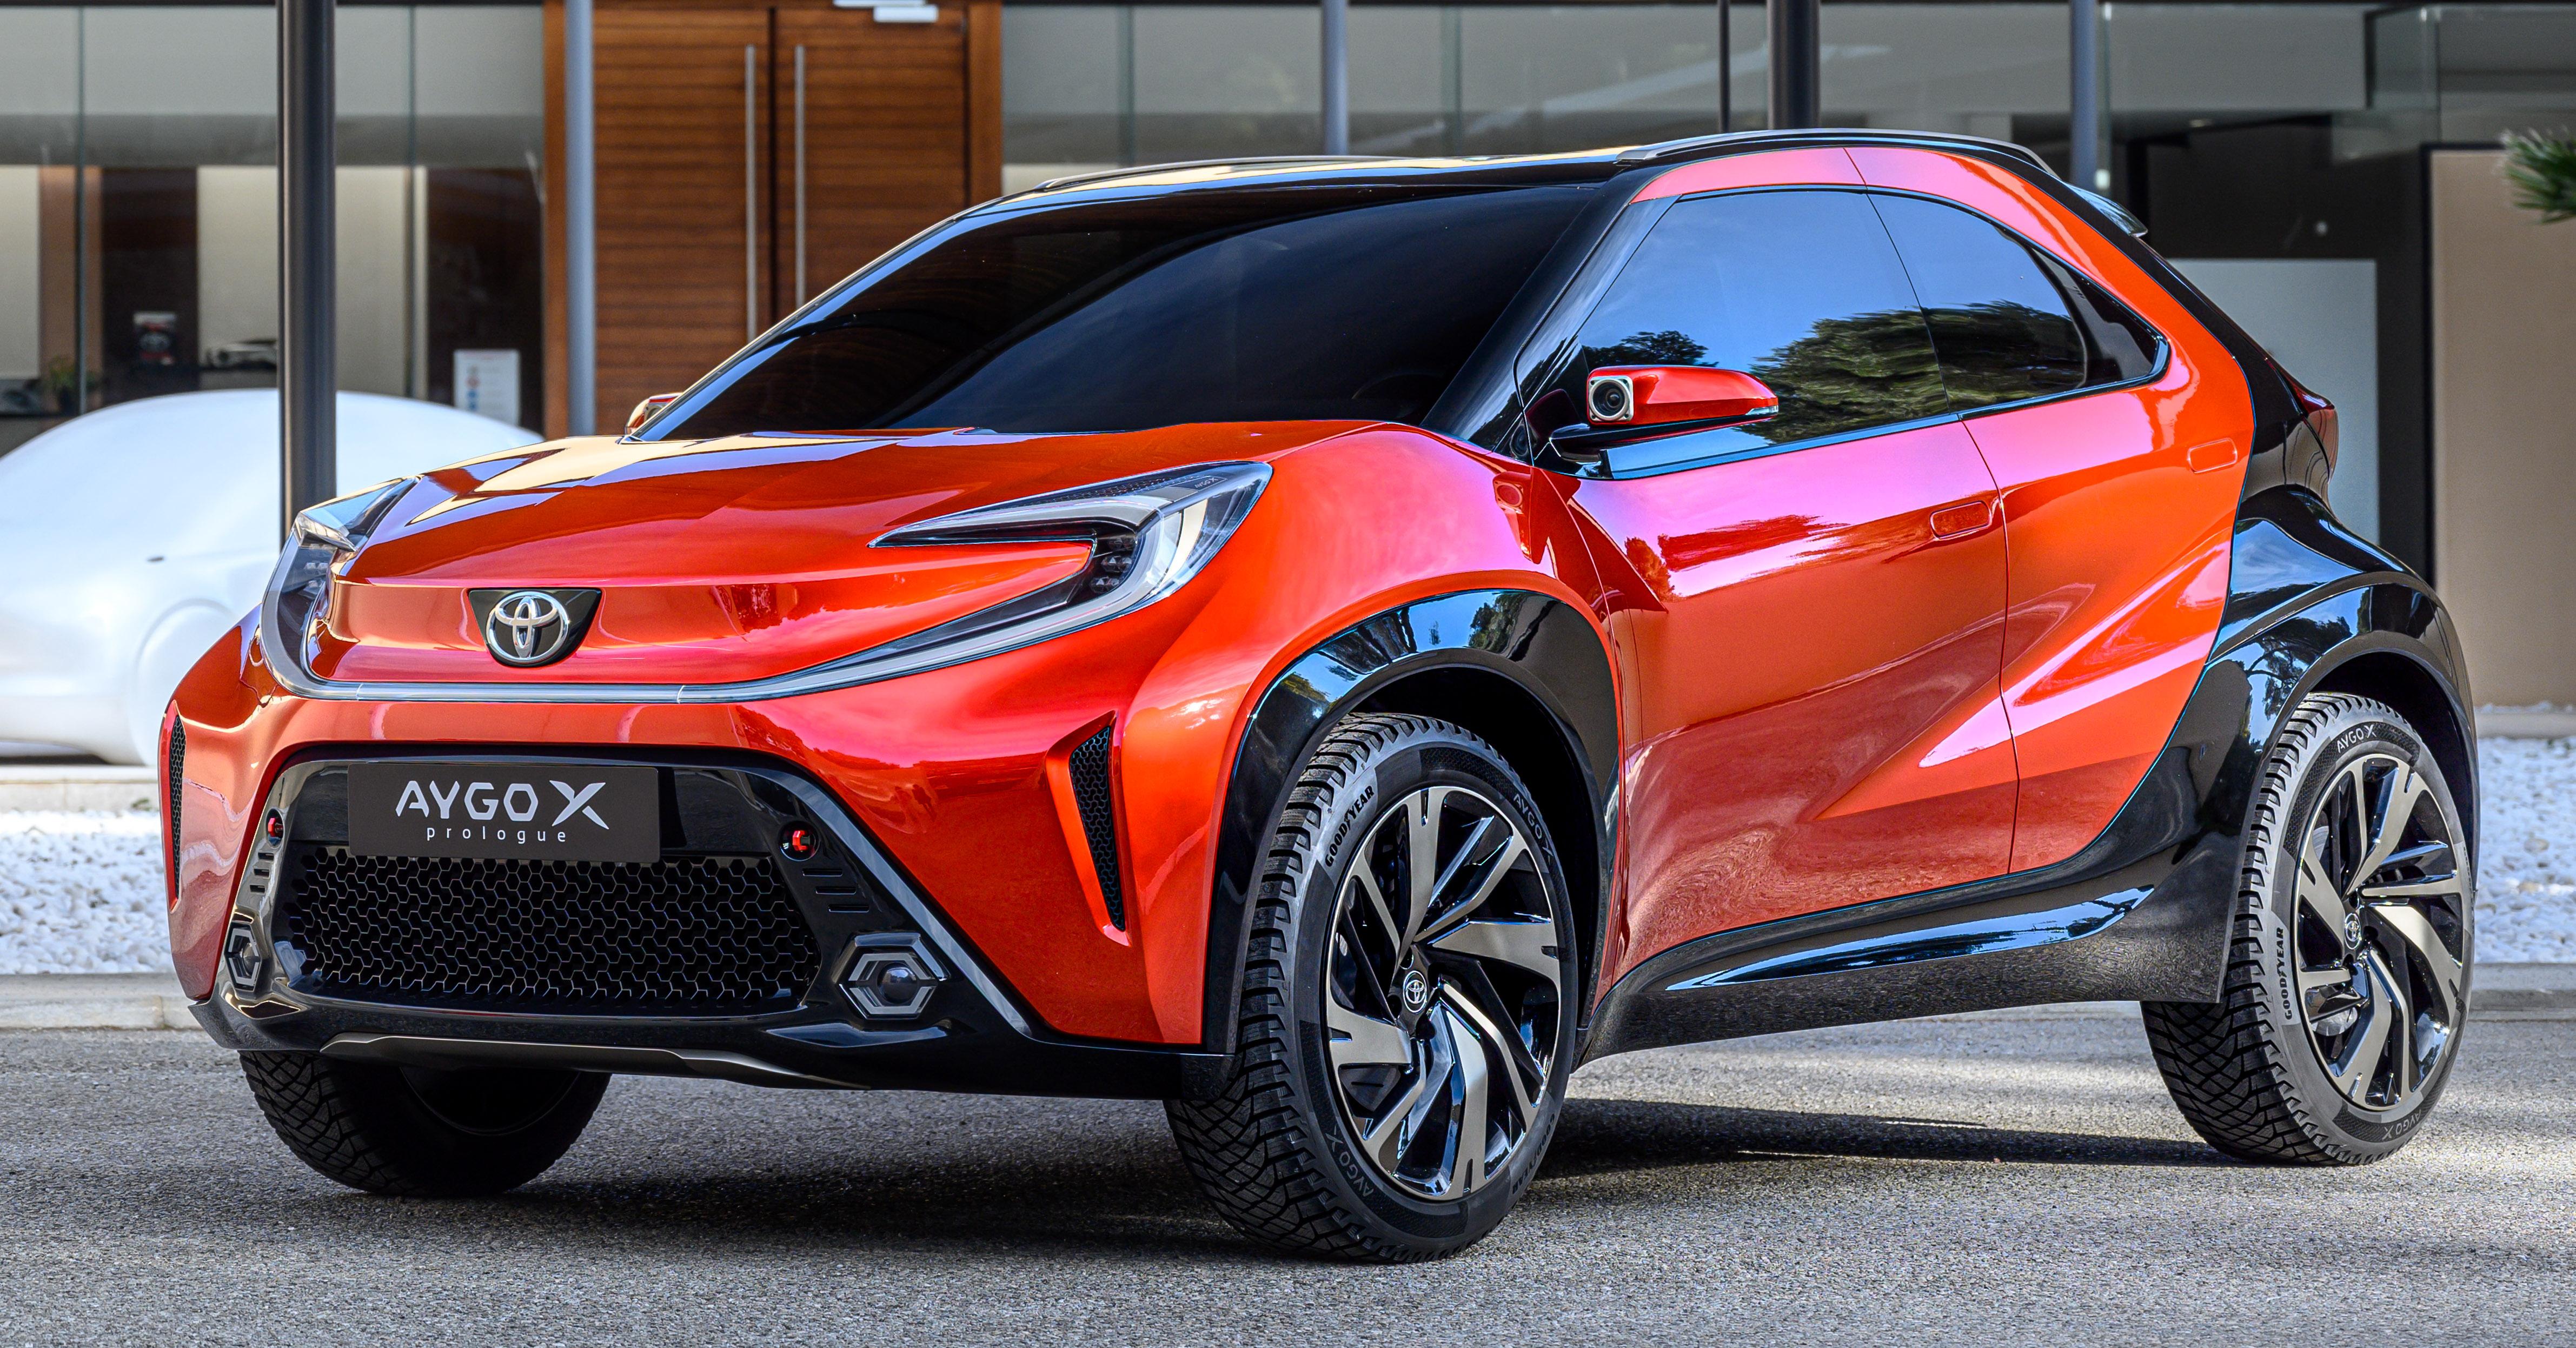 Koncept Toyota Aygo X Prologue debutuje - 30